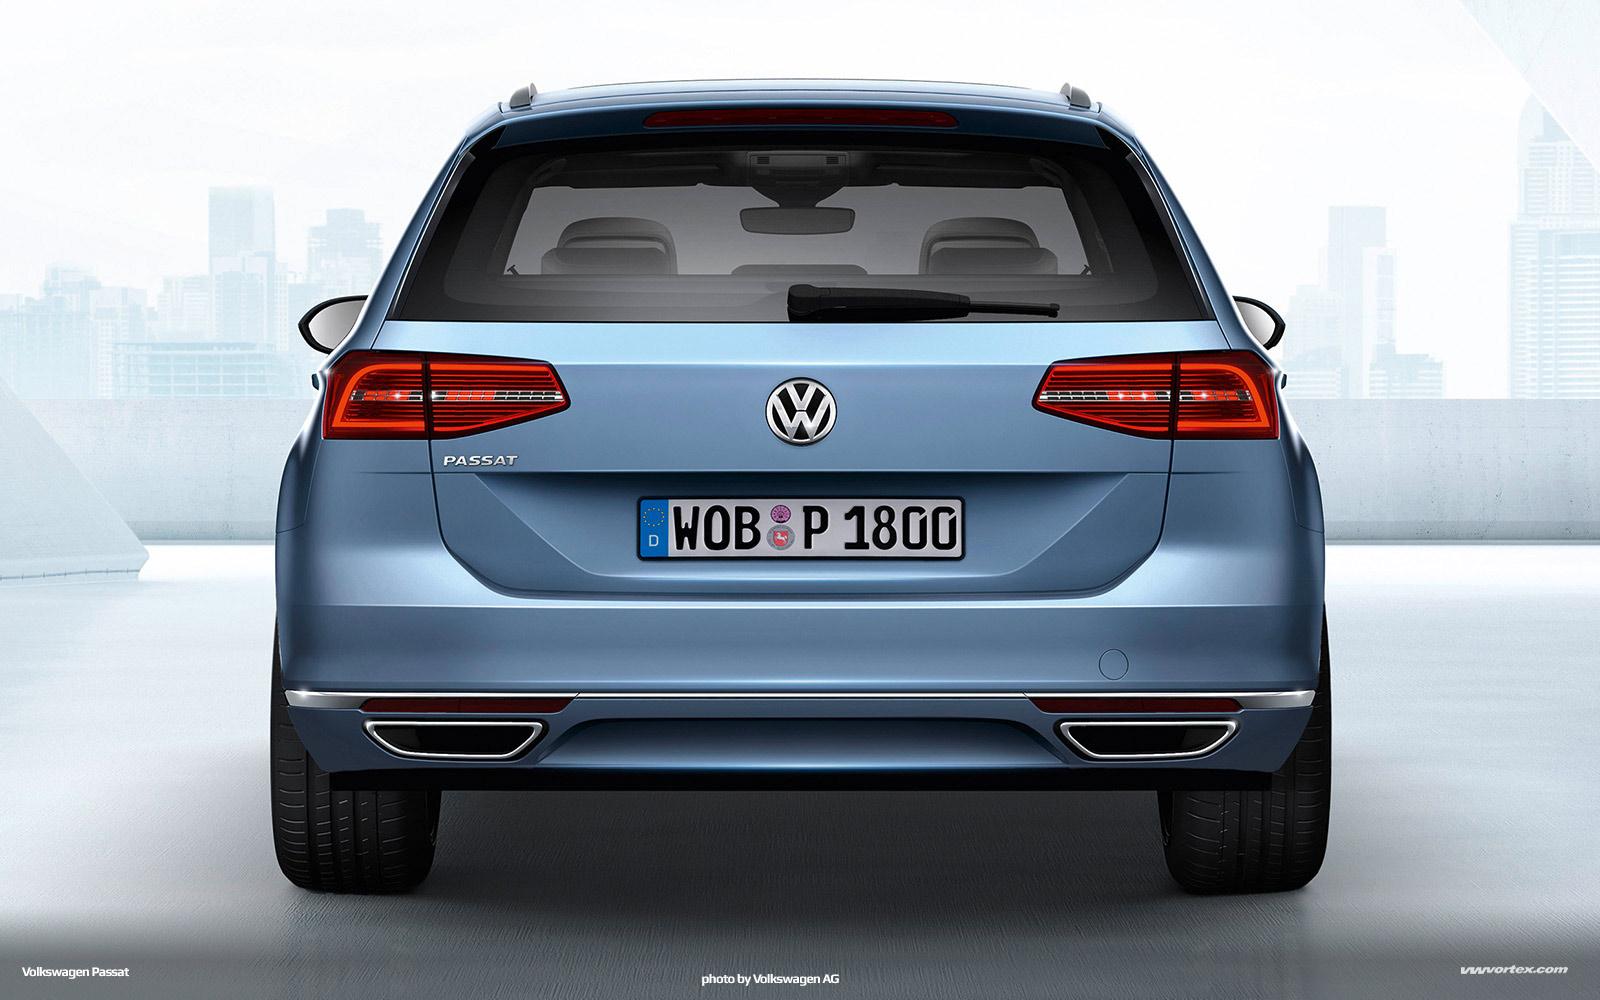 2014 Volkswagen Golf Bluemotion Concept Car Wallpaper Download 2014